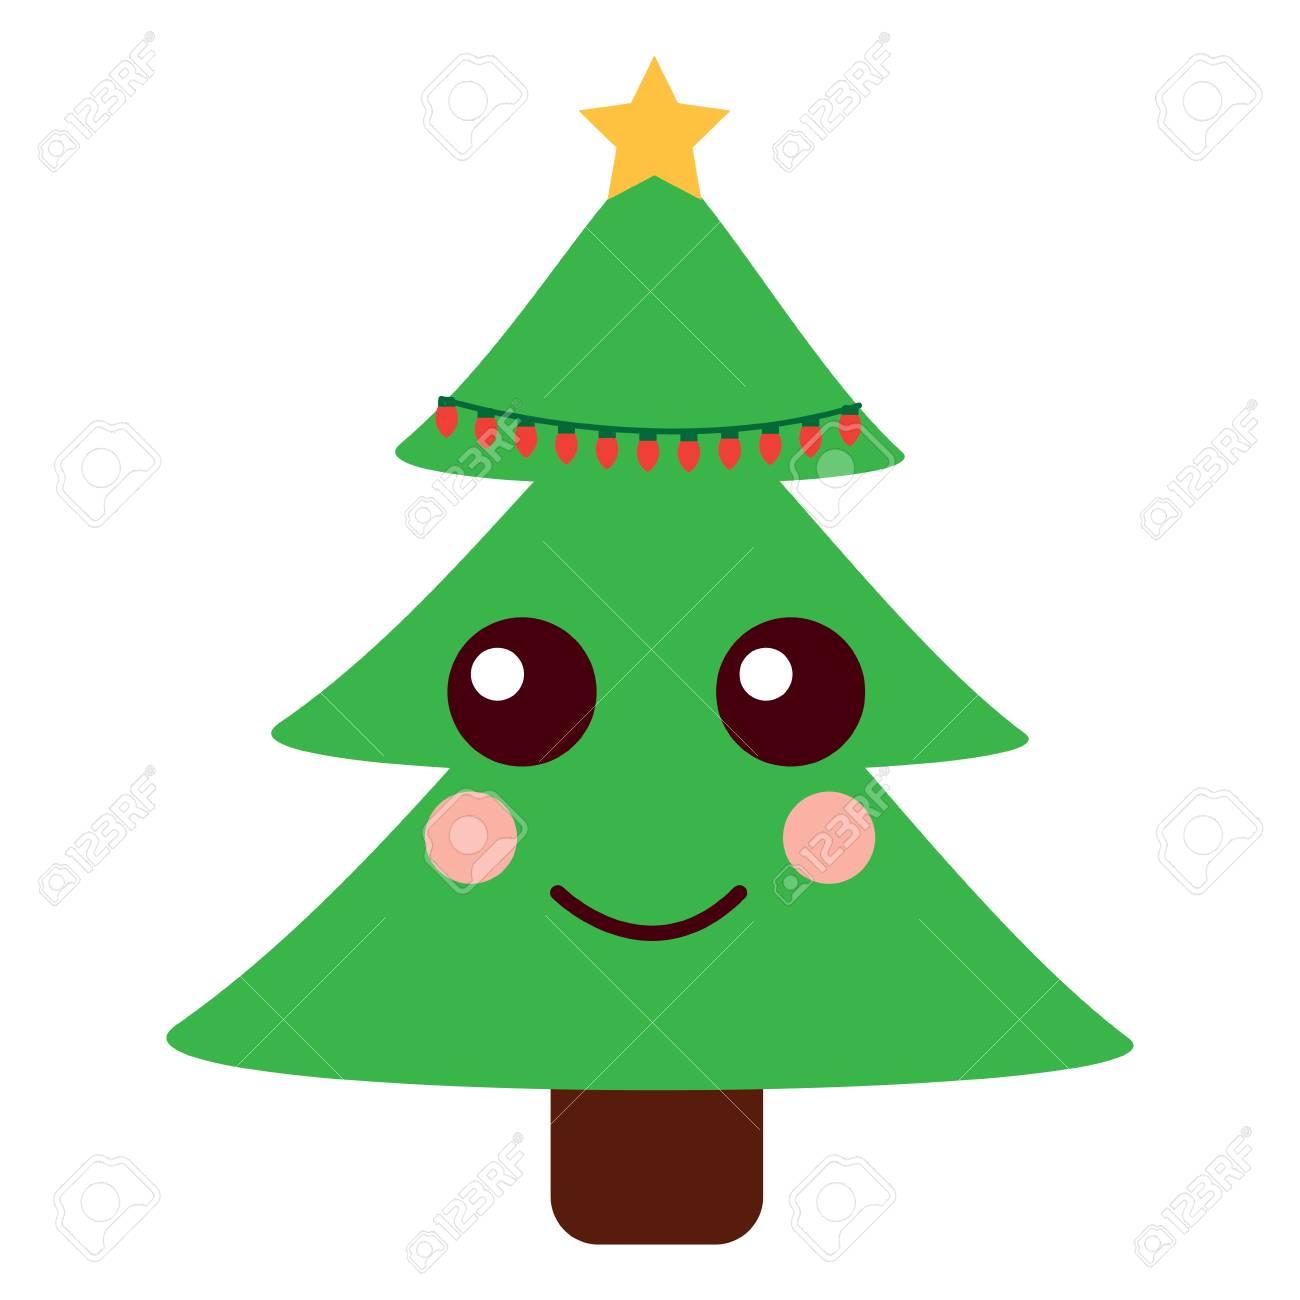 Kawaii Christmas.Kawaii Christmas Tree Cartoon Celebration Vector Illustration